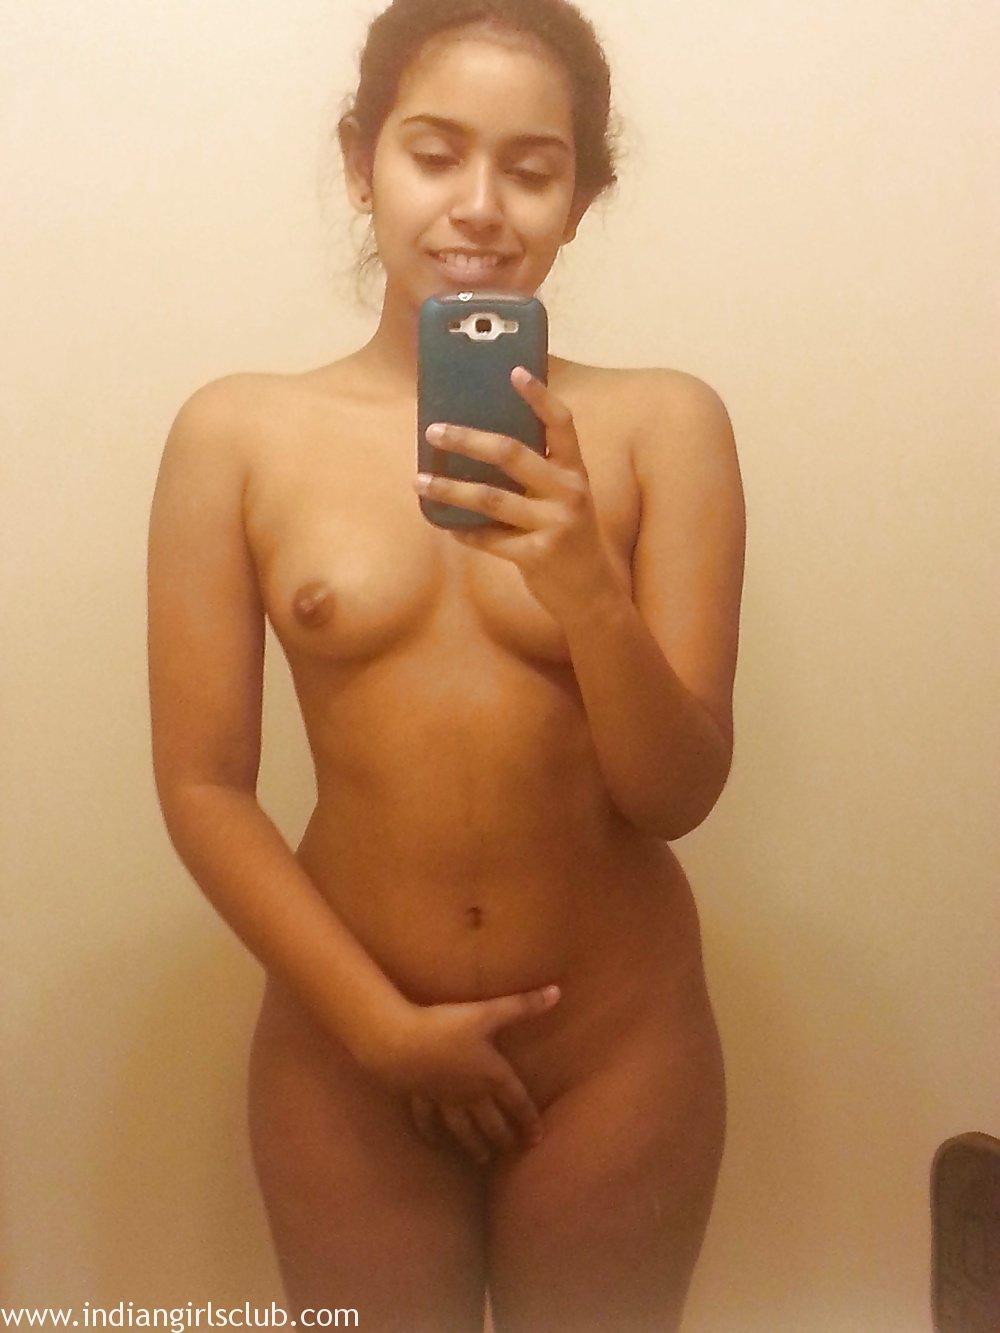 Photography taken nude self